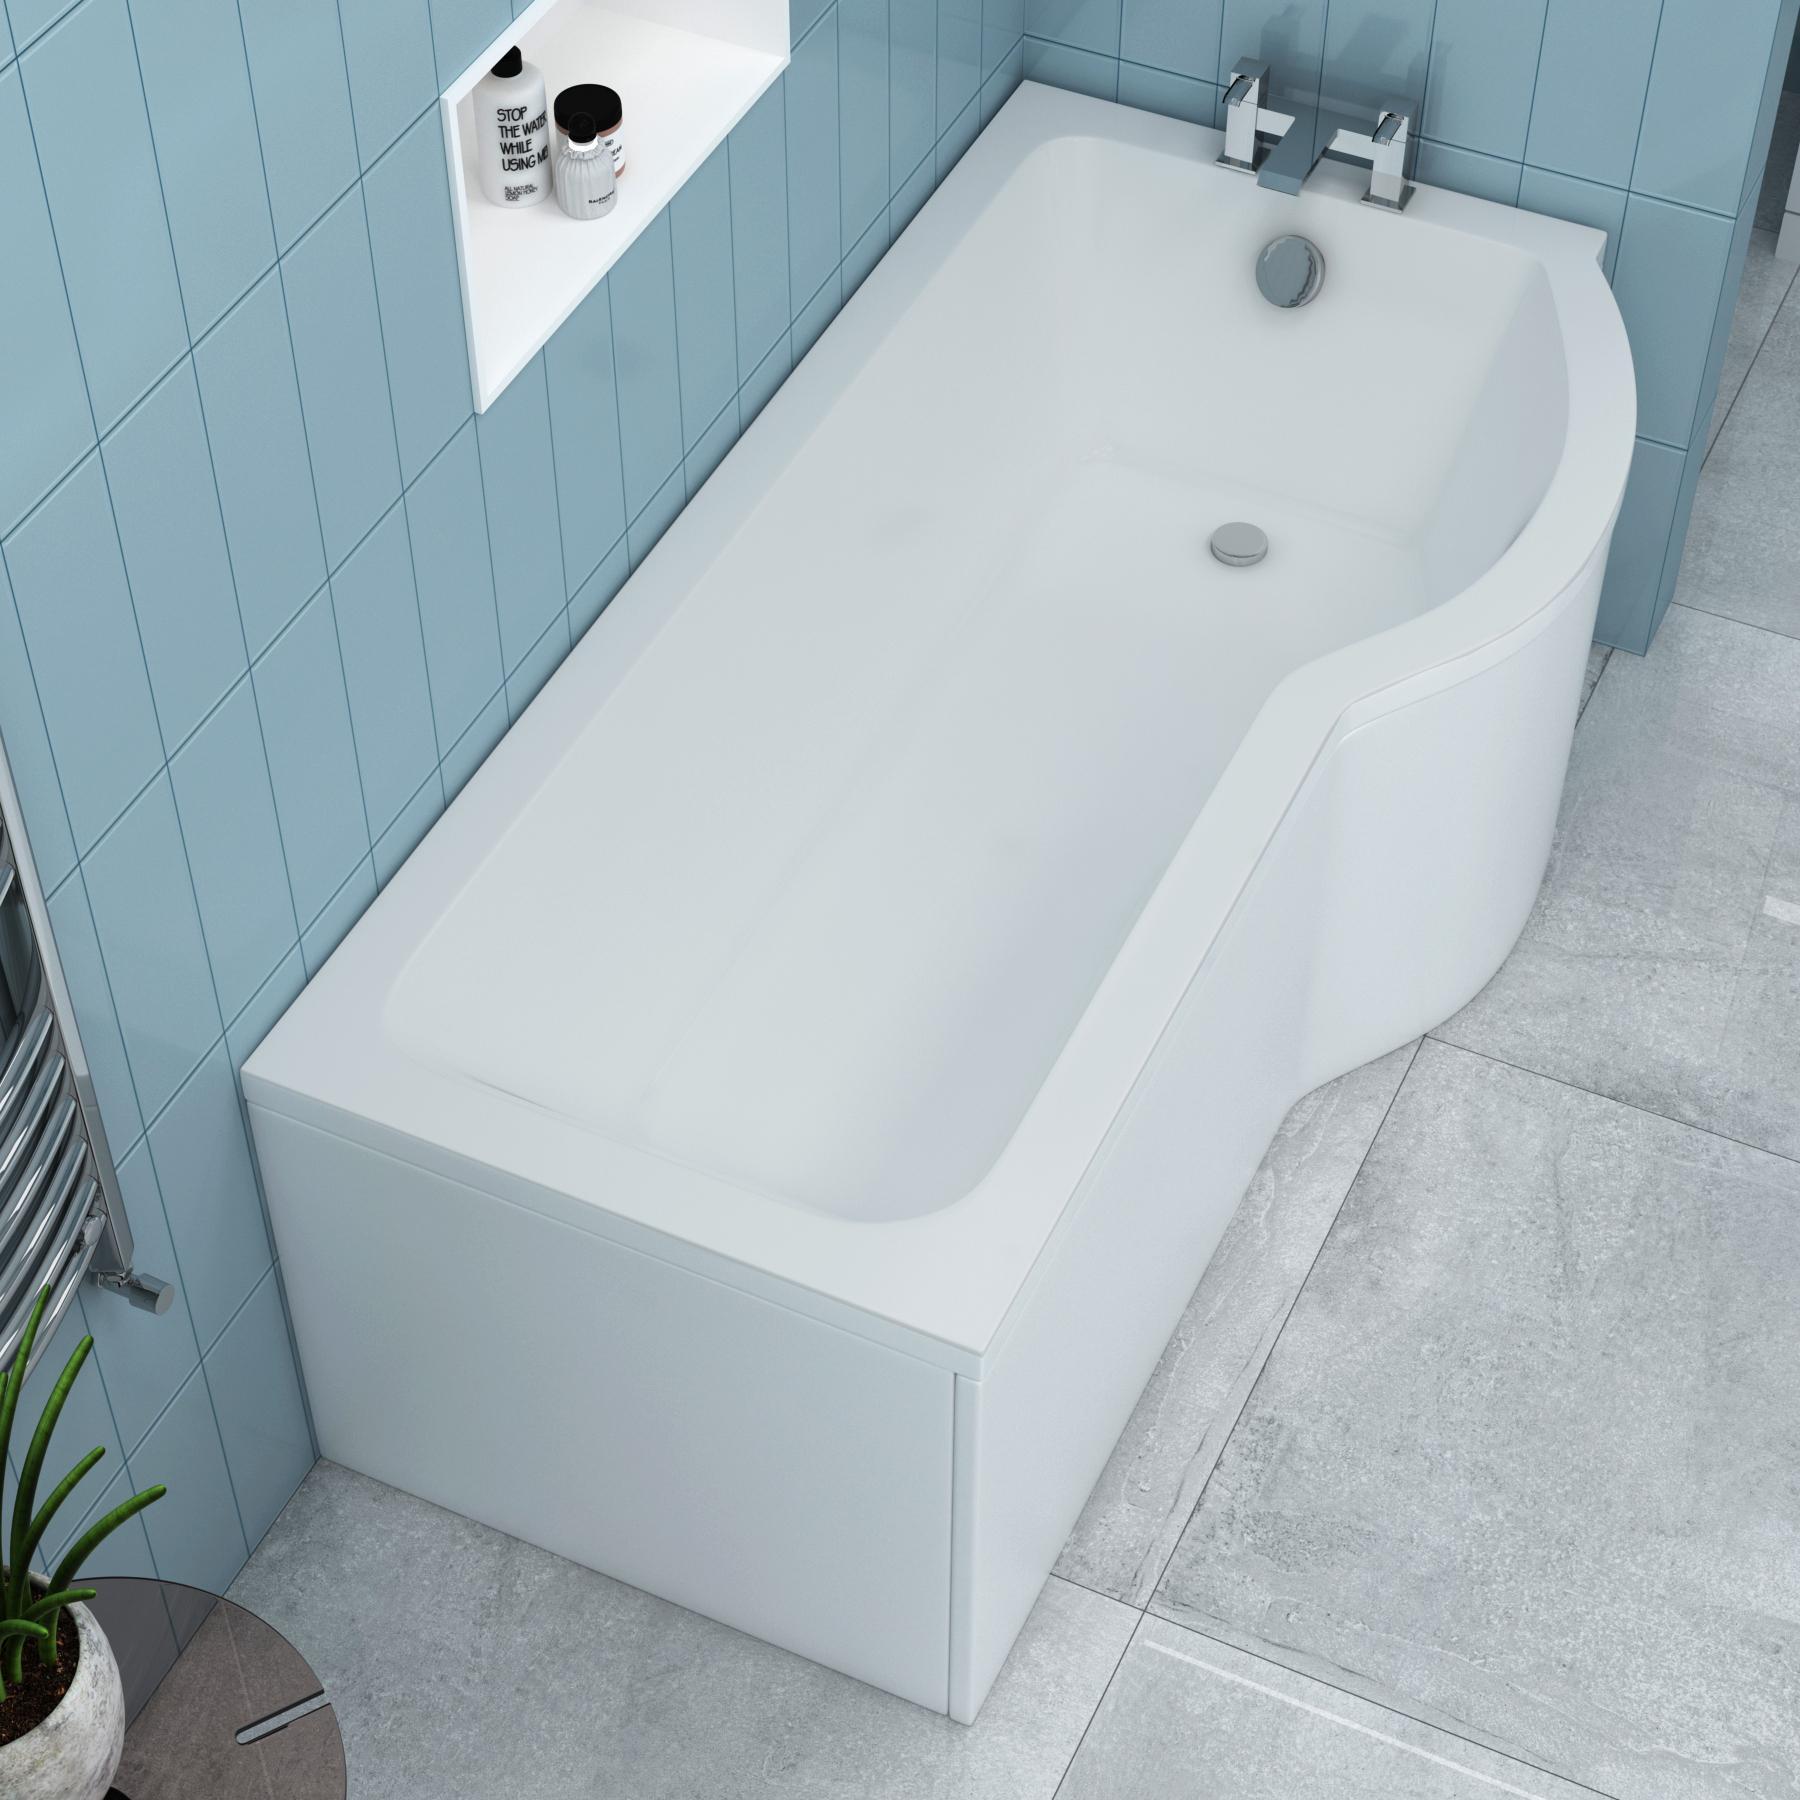 Royal Bathrooms Abacus 1700 x 850mm P-Shaped Right Hand Shower Bath tub with Leg Set